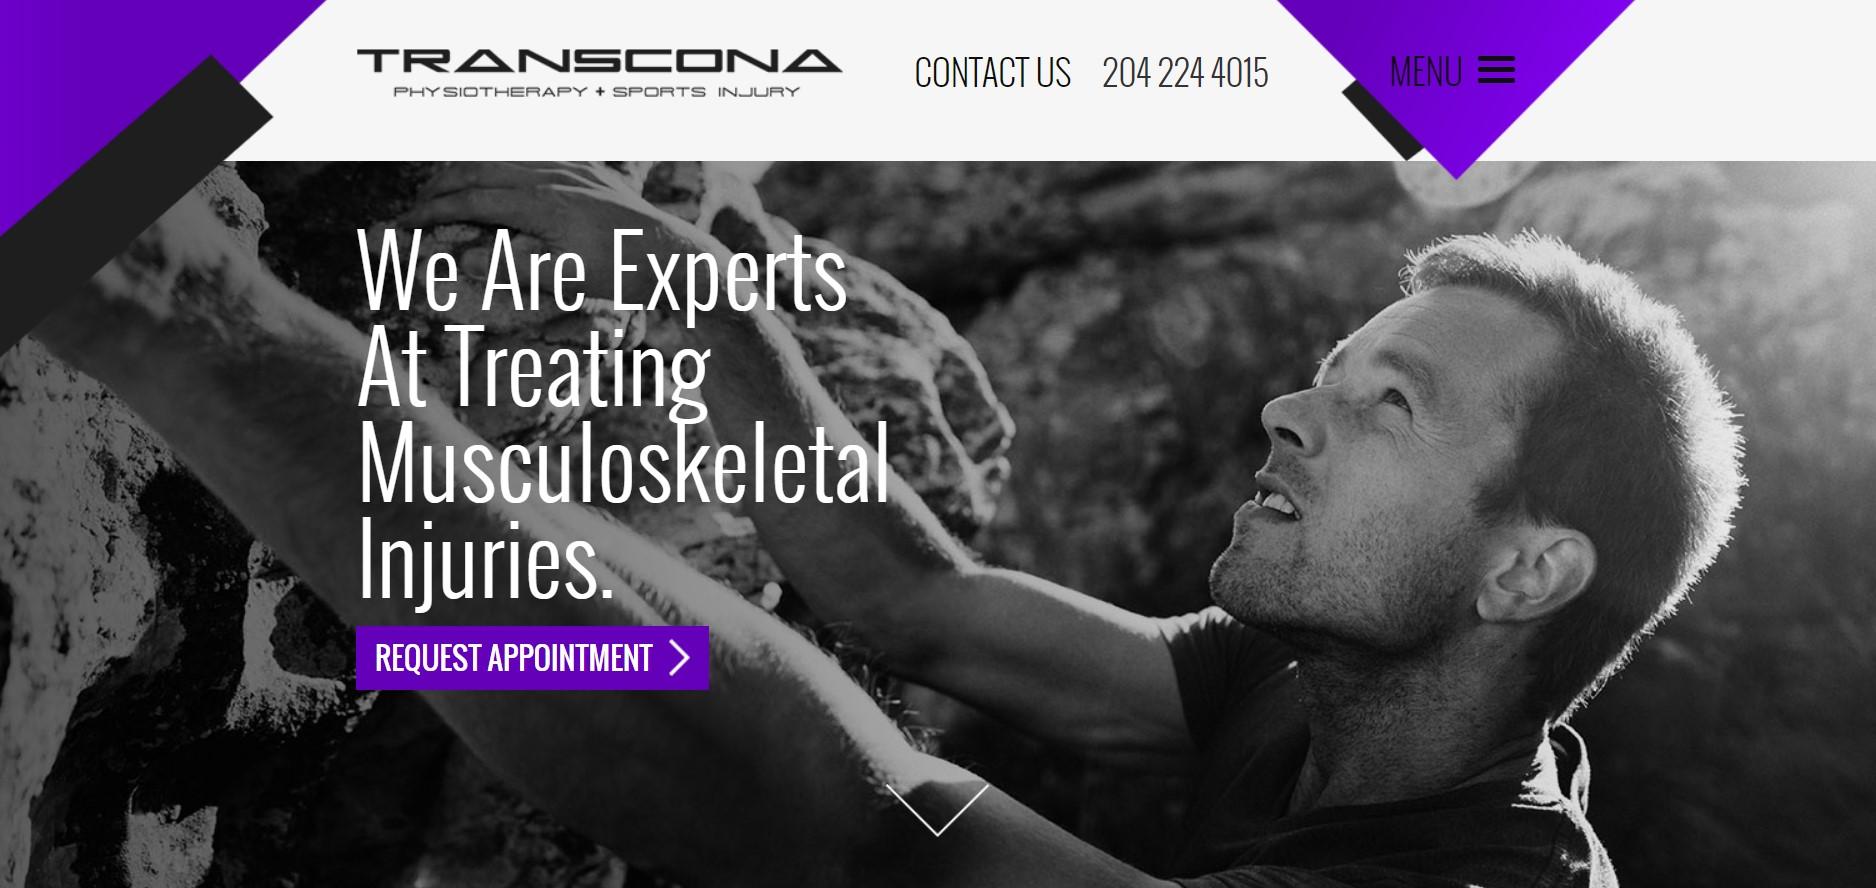 transcona sports massage clinic in winnipeg